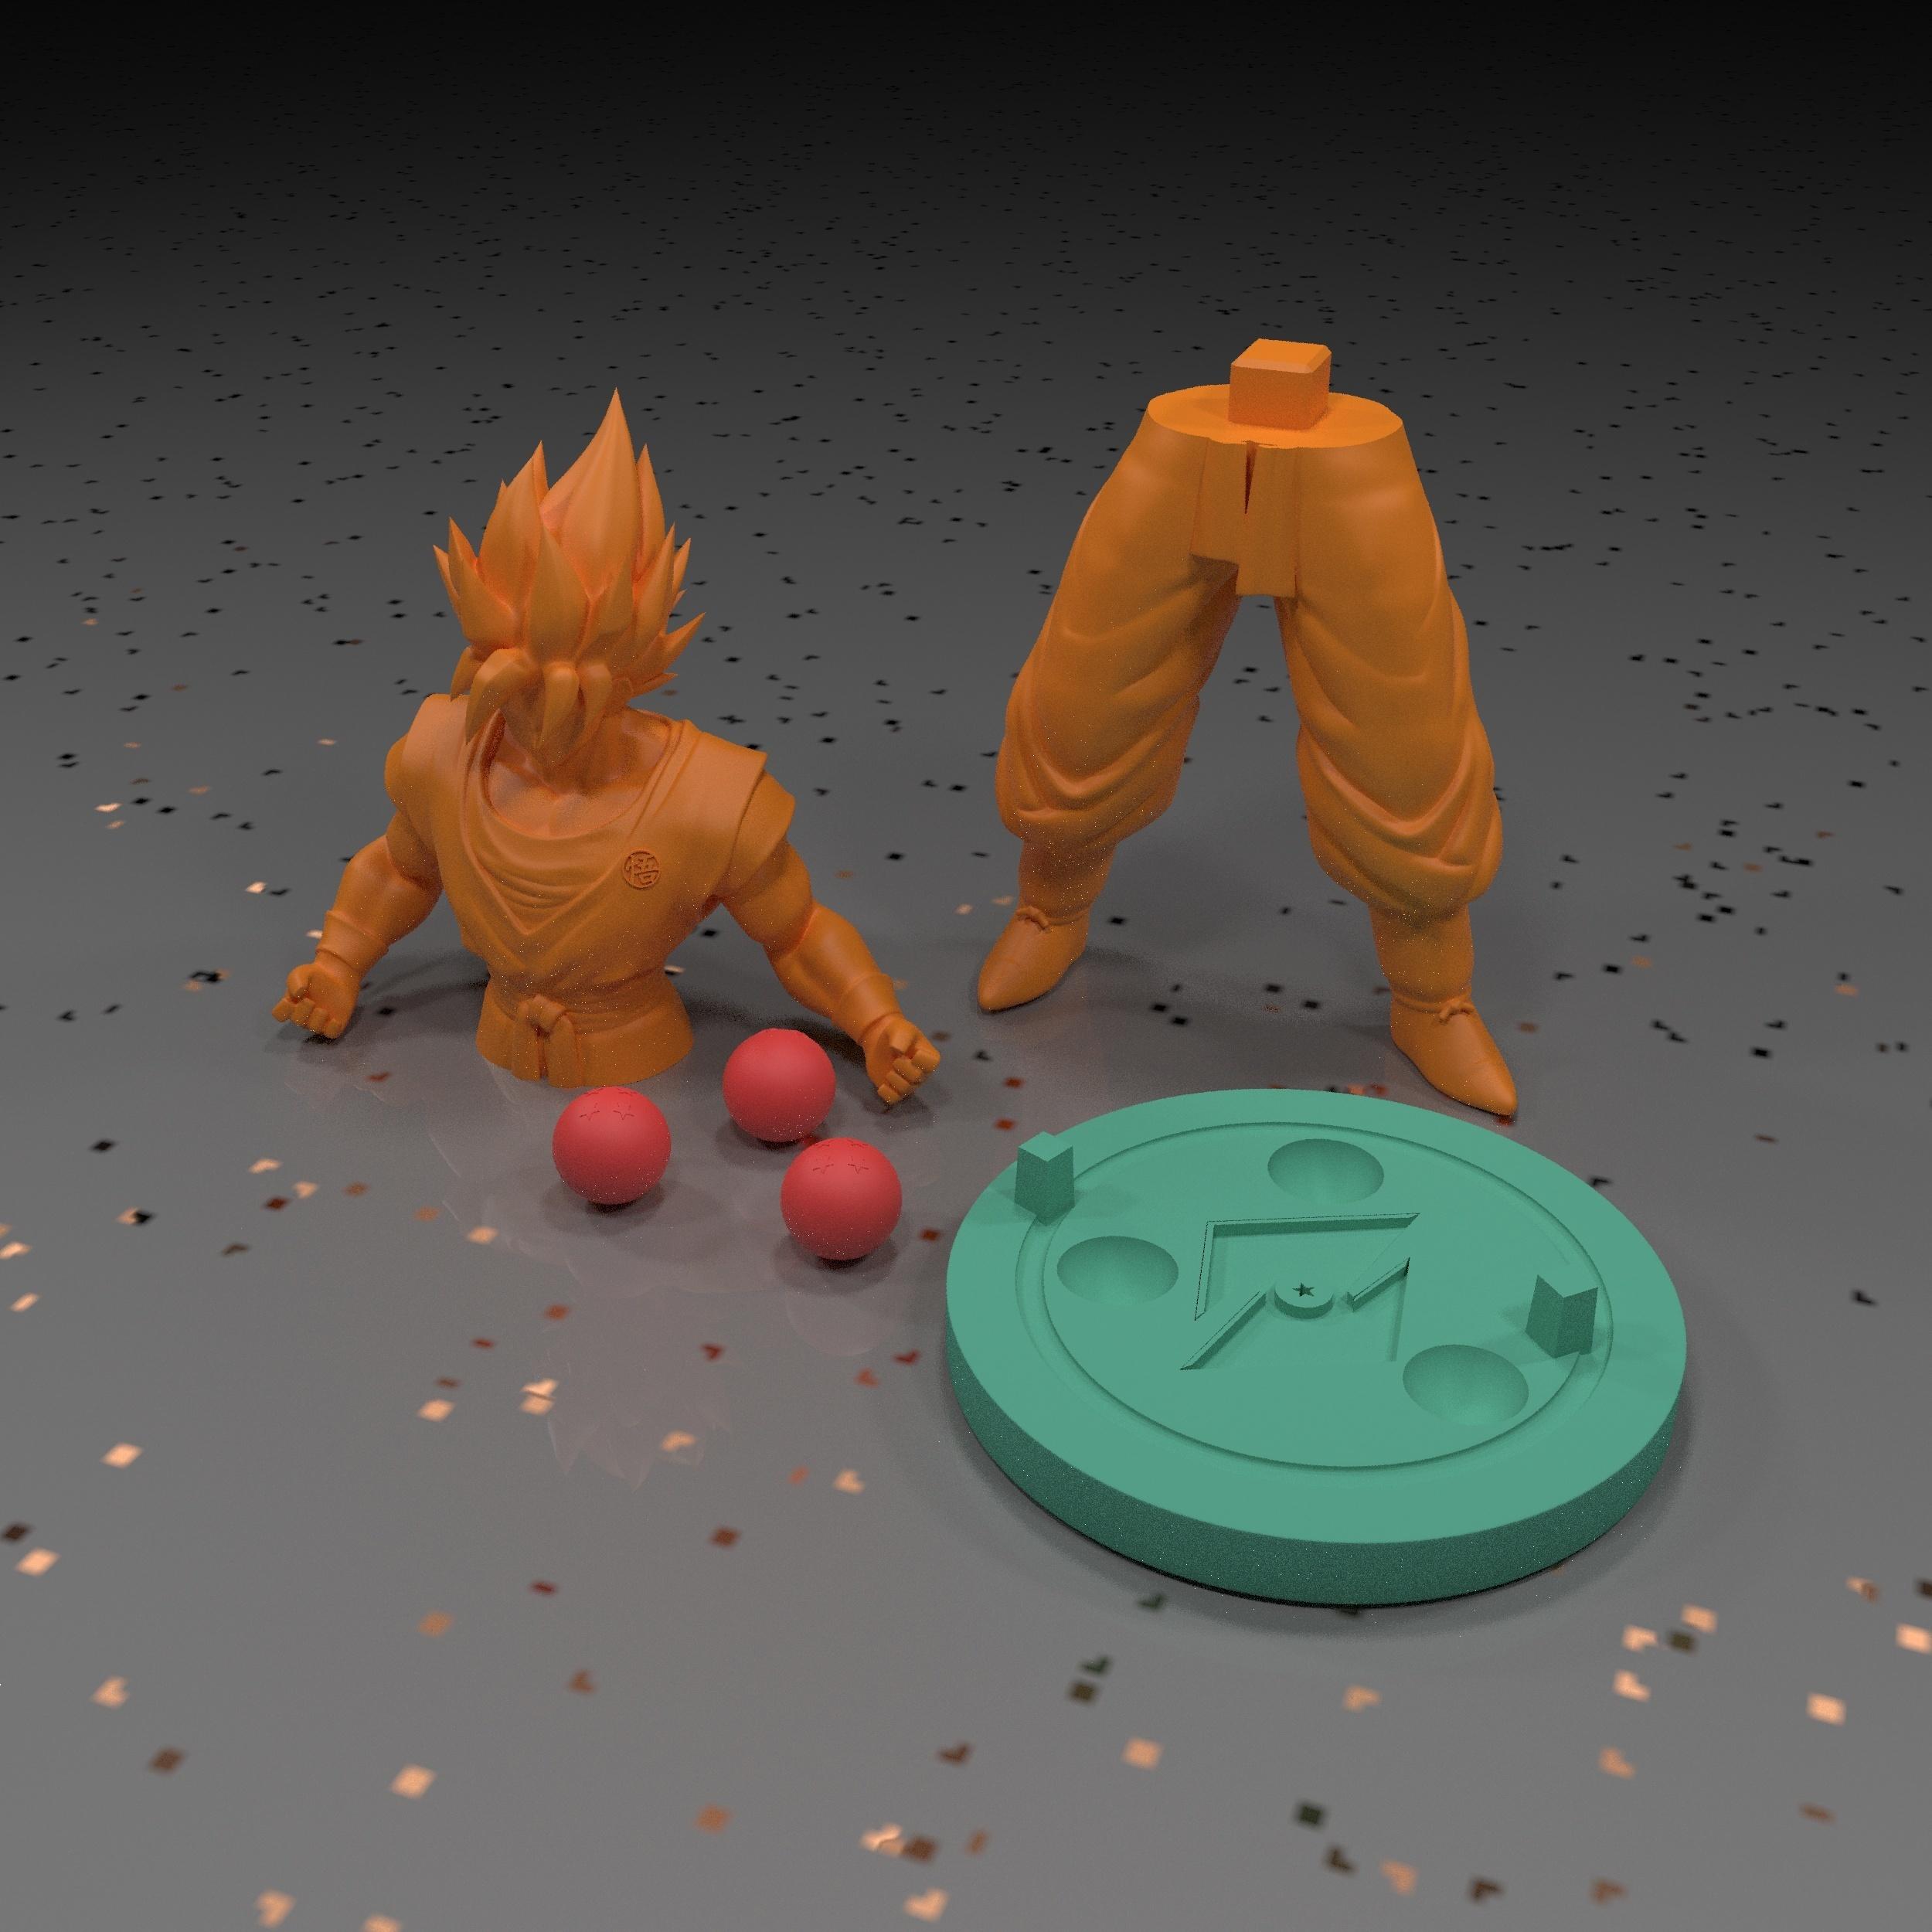 9.jpg Download free STL file Goku (Super Saiyan) • 3D printer template, paltony22